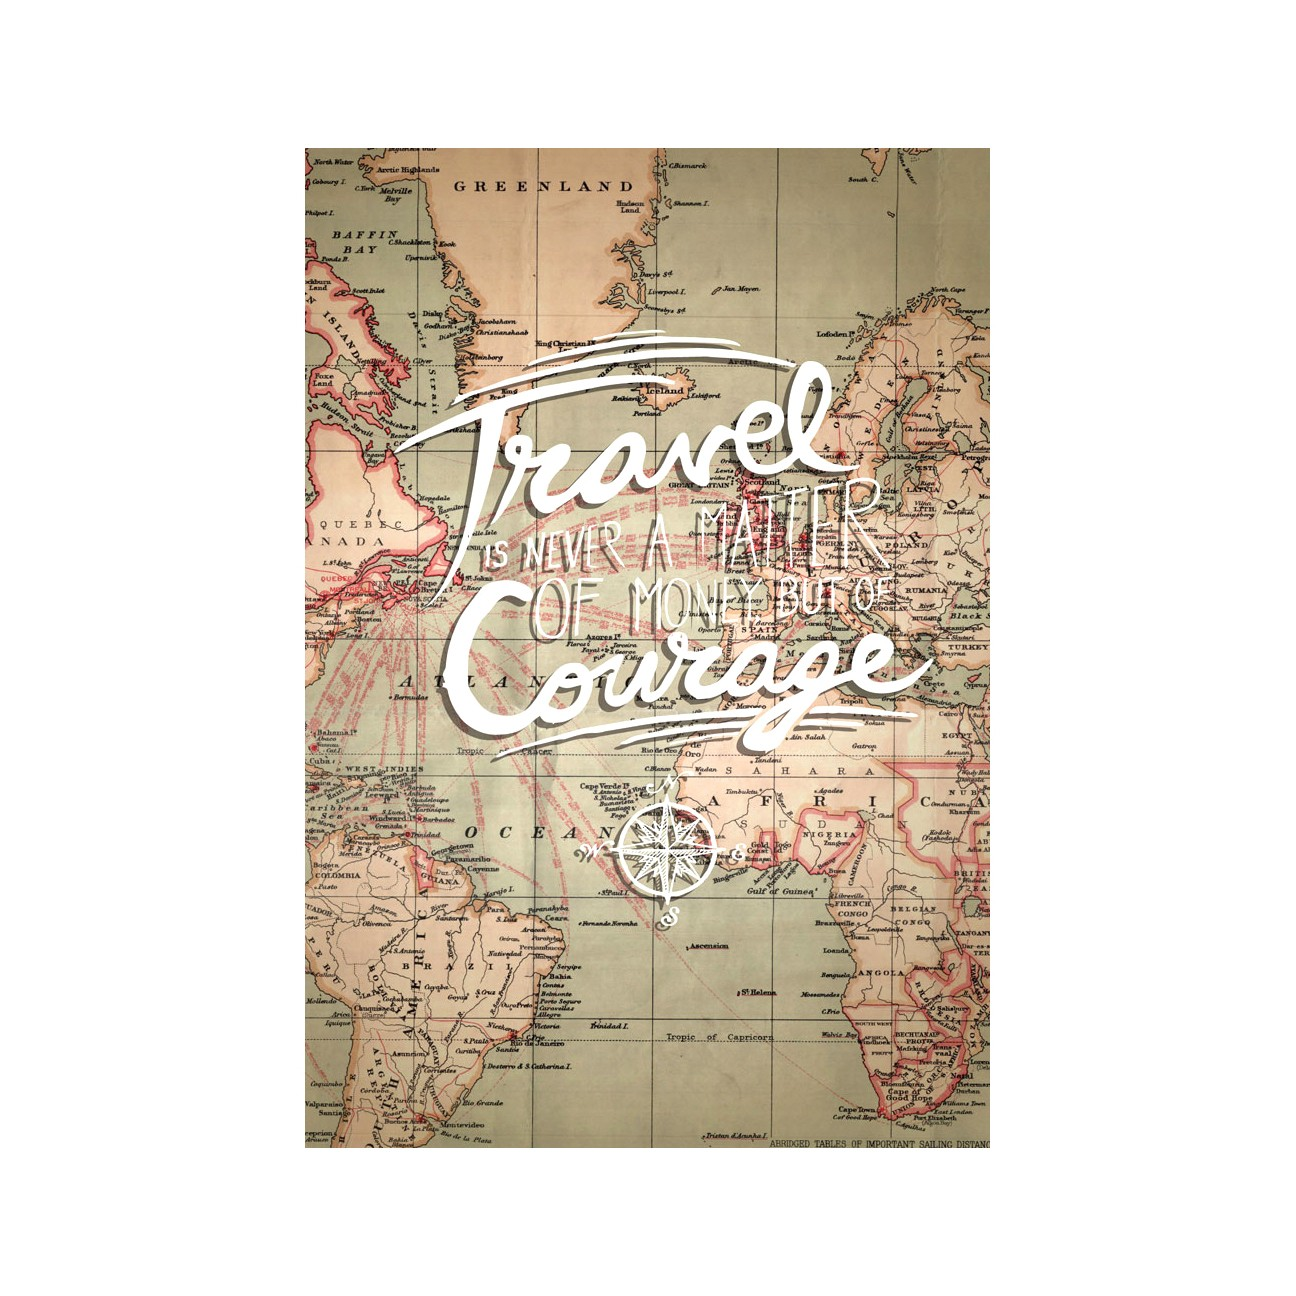 Tablou PT1440 Travel & courage, panza canvas + sasiu brad, stil motivational, 60 x 45 cm